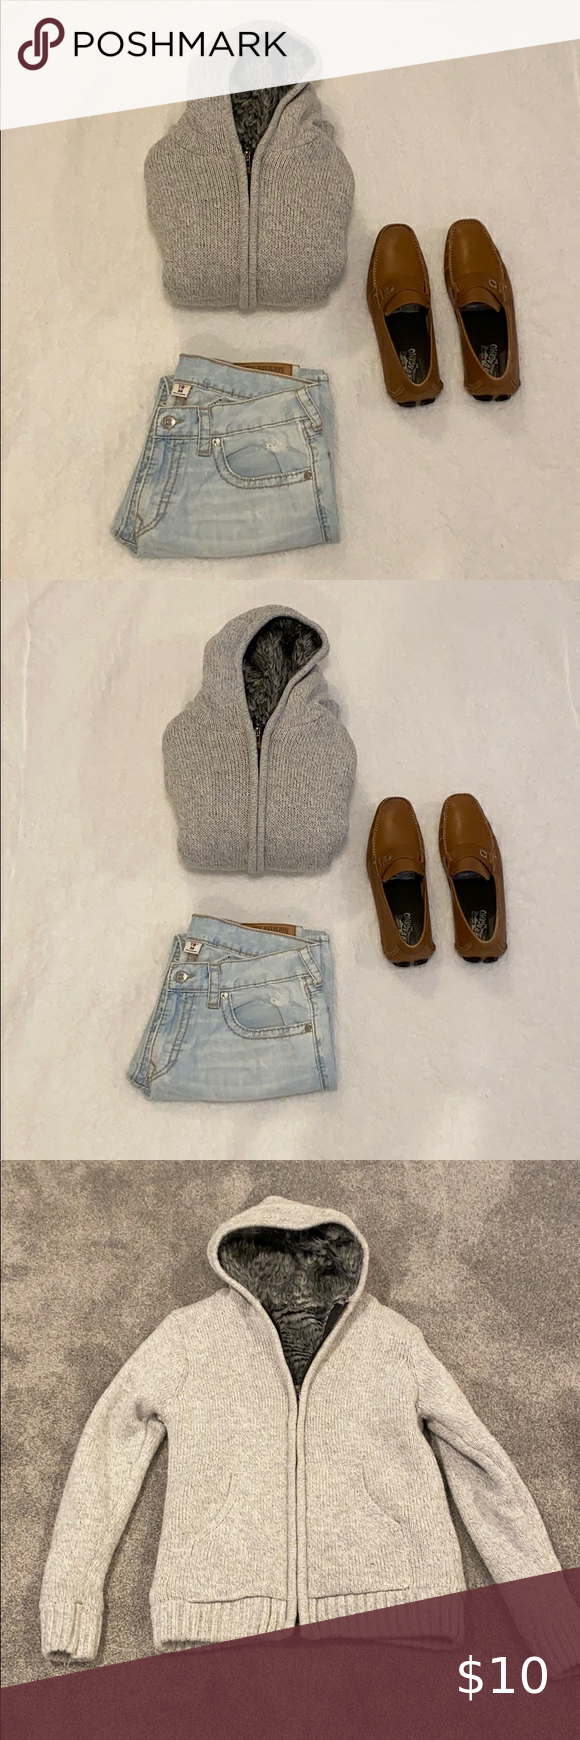 Men Wool Sweater Zip Up Hoodie Size Medium